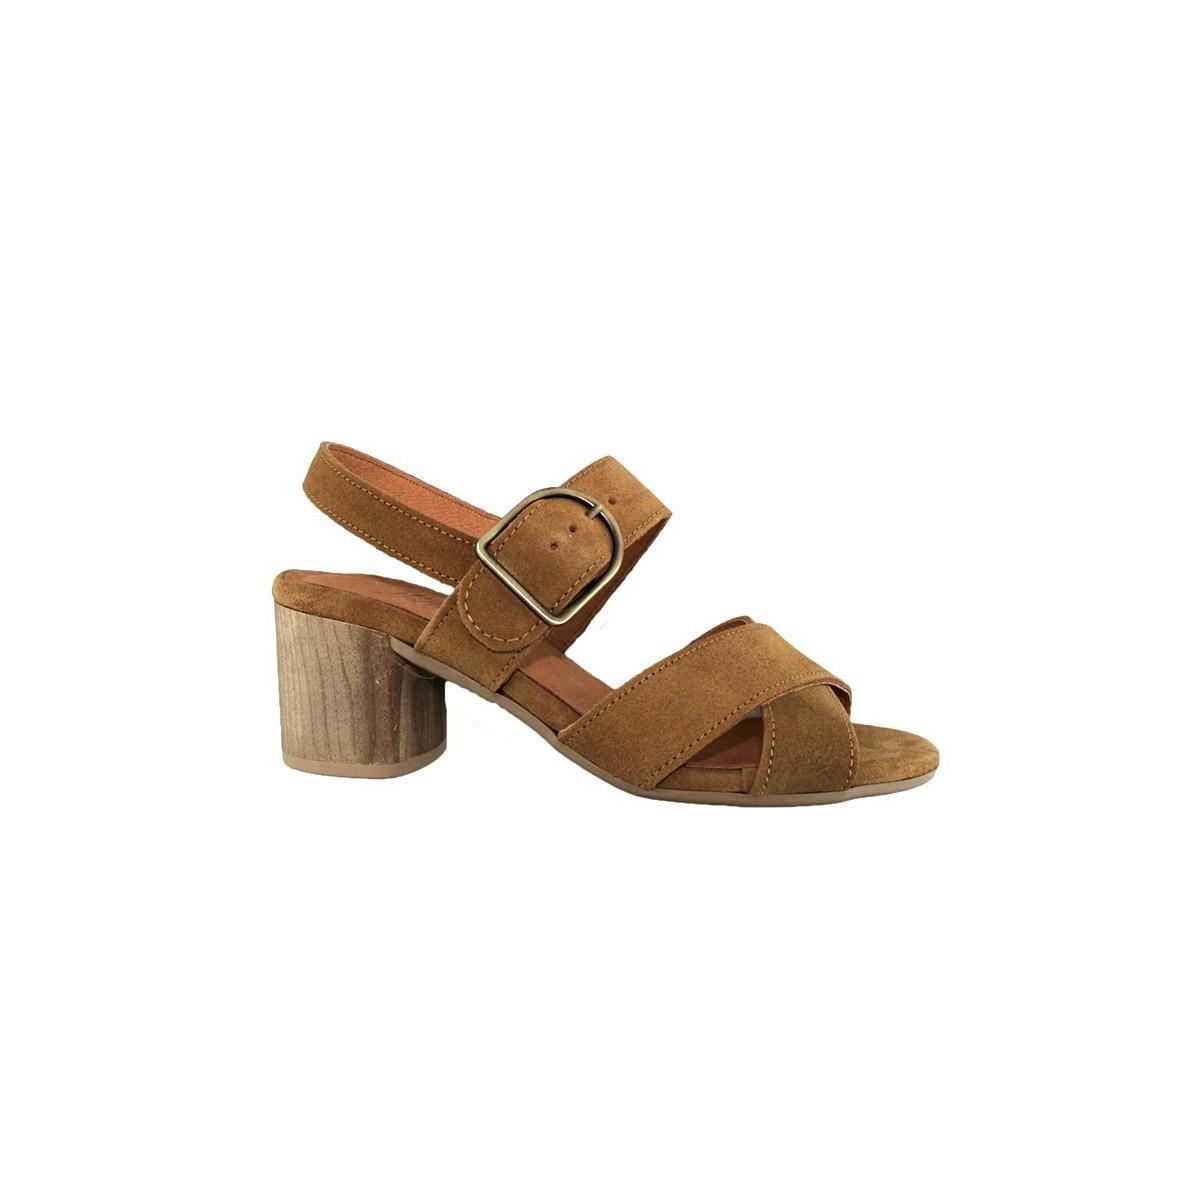 Sandale Minka Hawk Camel